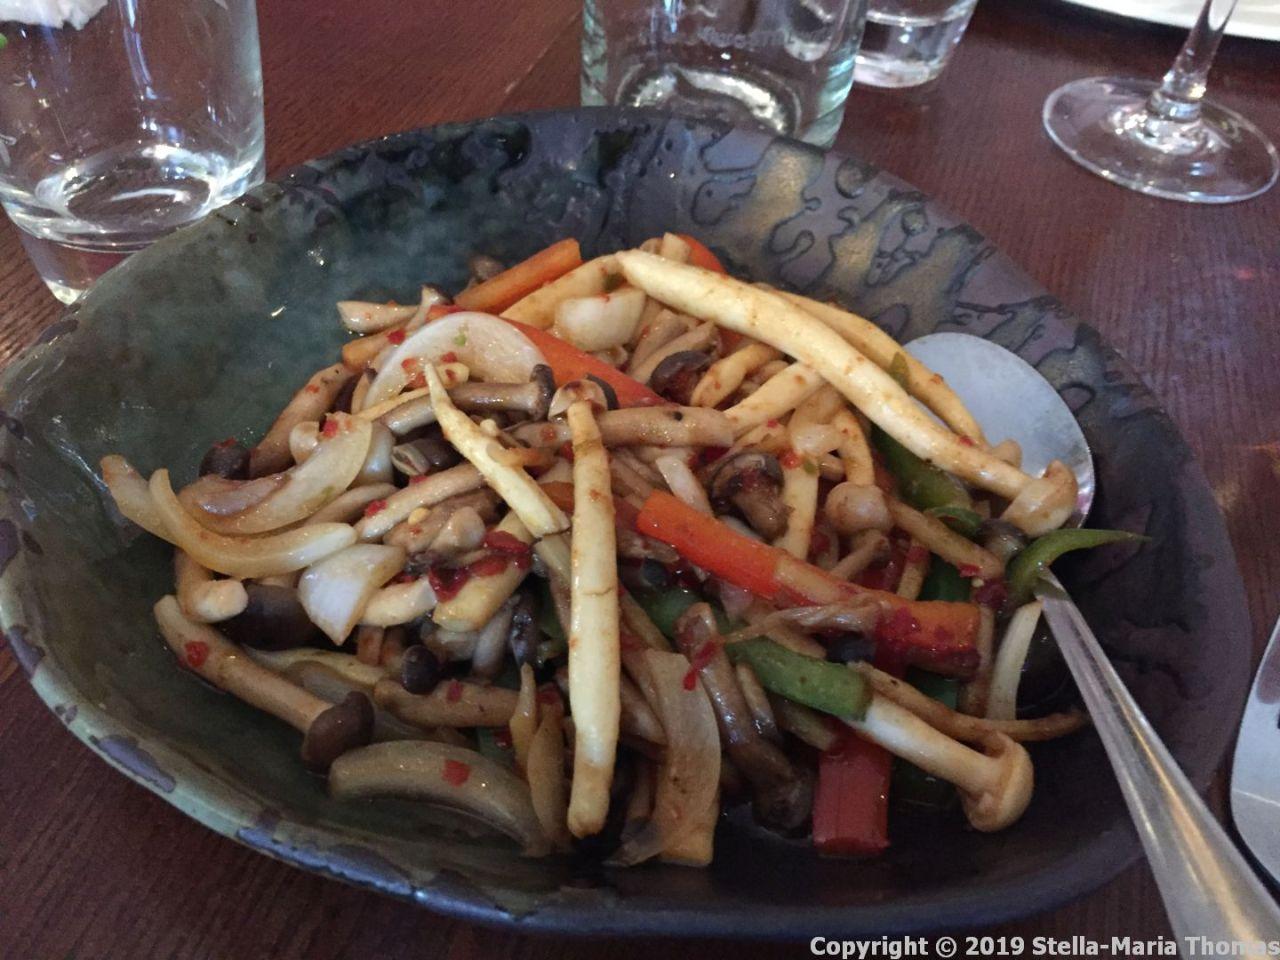 THE CHINESE CRICKET CLUB, SAUTEED CHILLI WILD MUSHROOMS 002